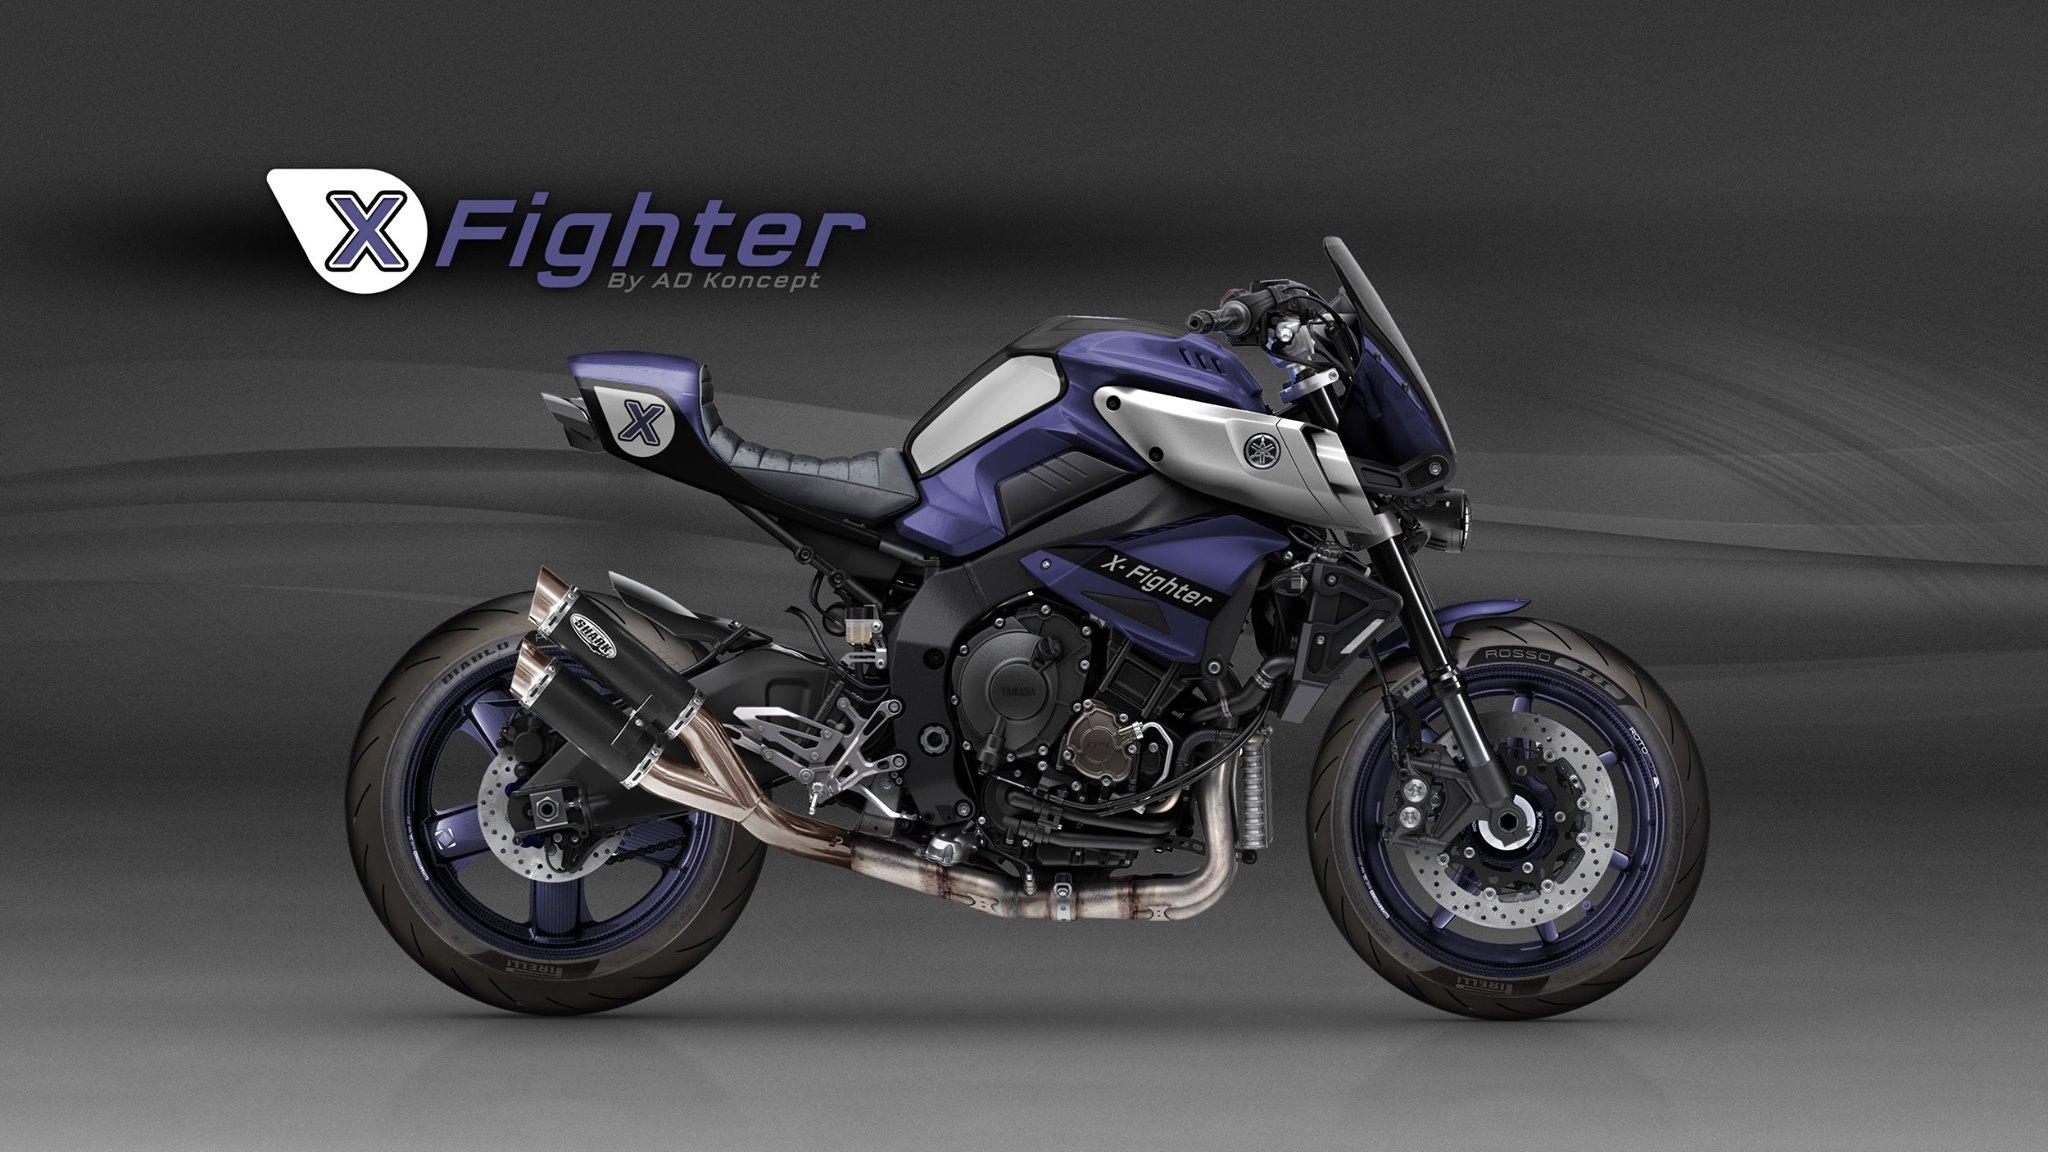 ad koncept custom FZ-10 1